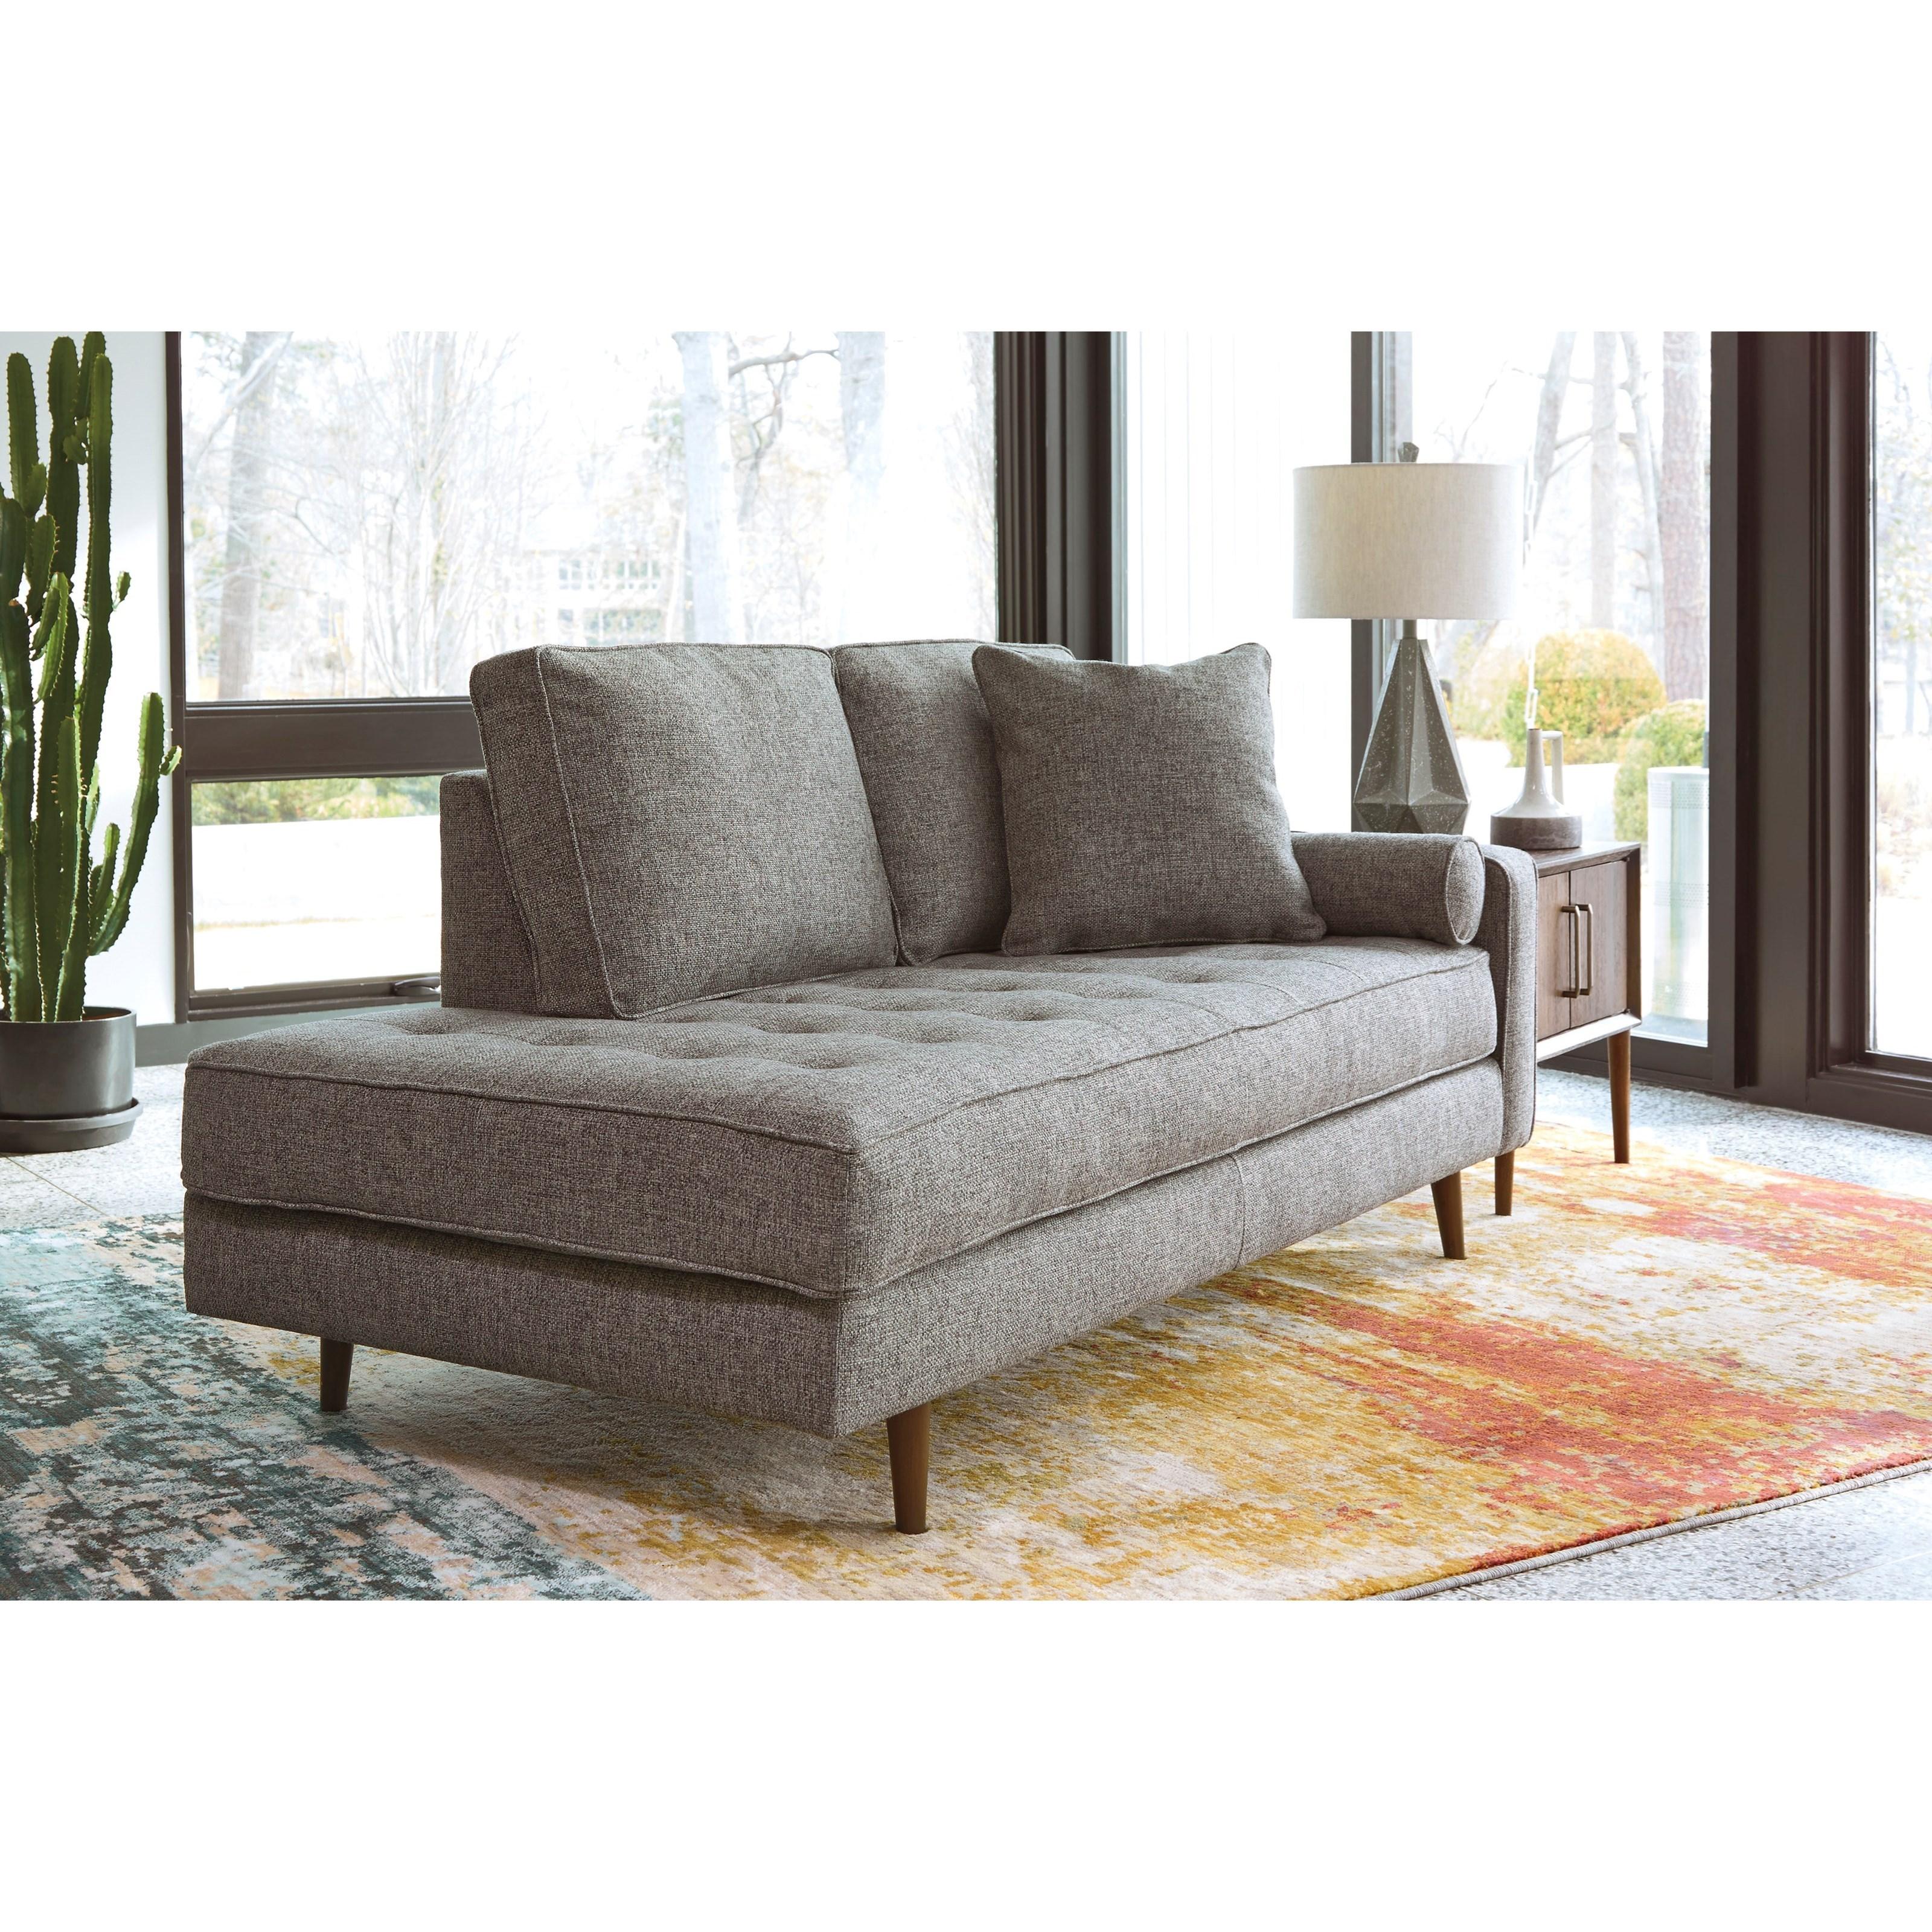 Ashley Furniture Zardoni 1140217 Mid Century Modern Right